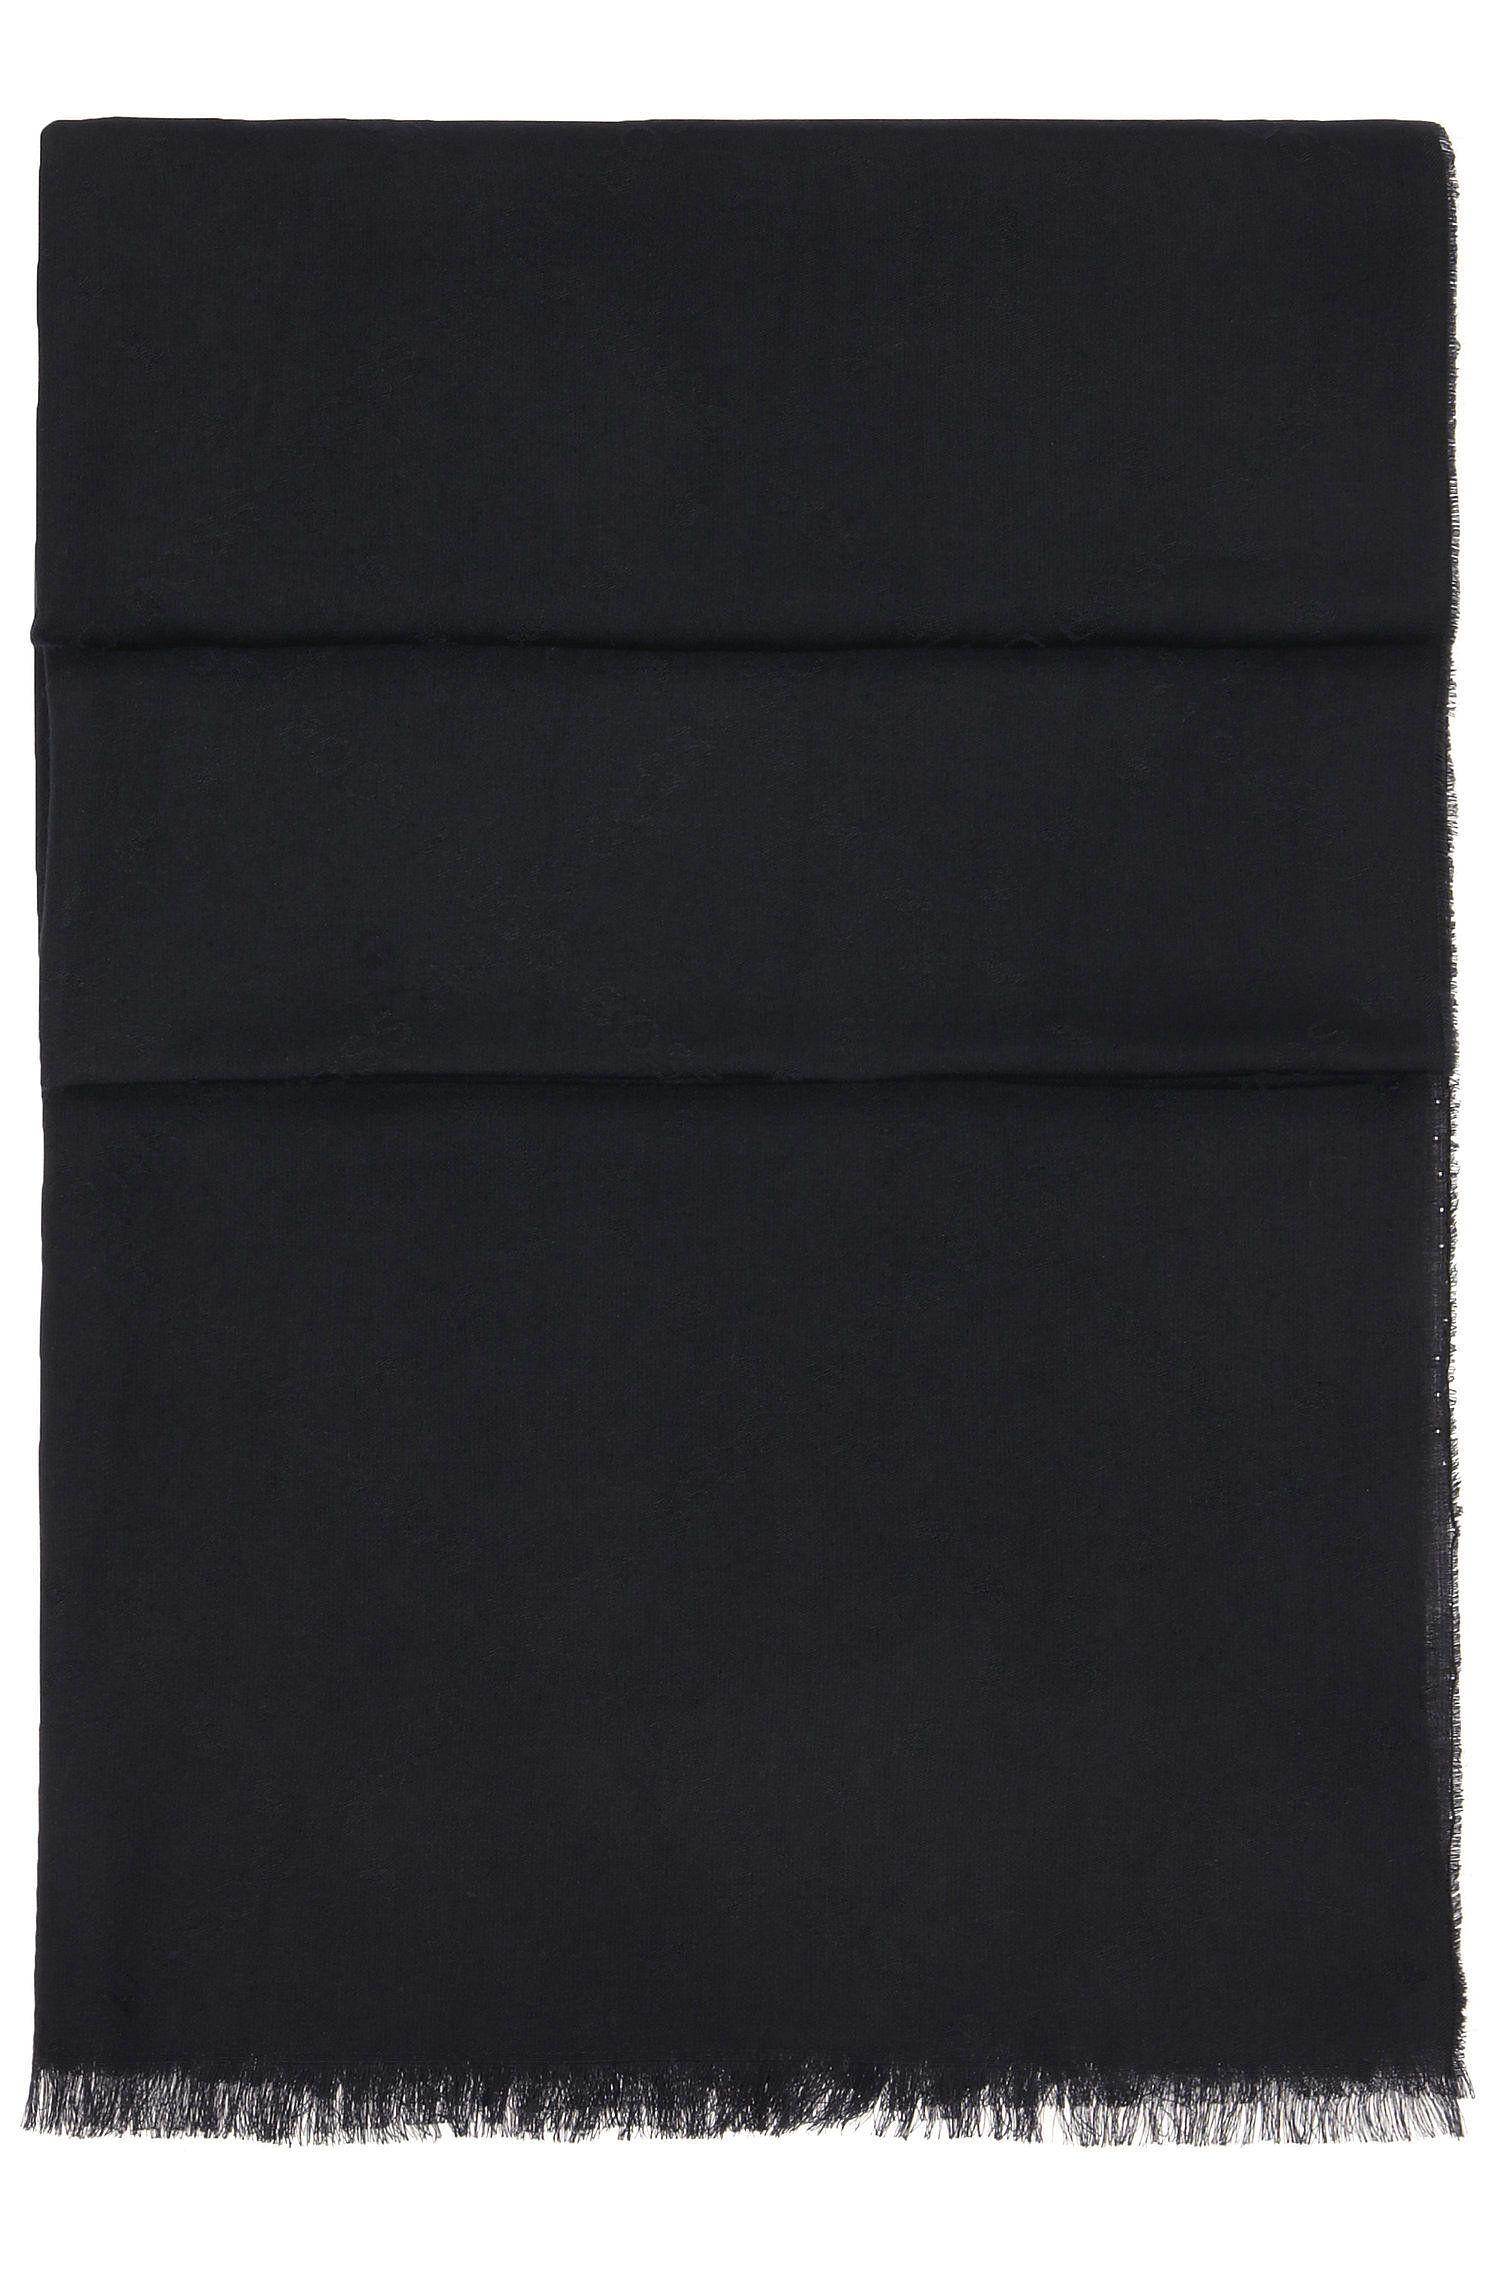 Chal tejido de modal: 'Scarf-Calso'